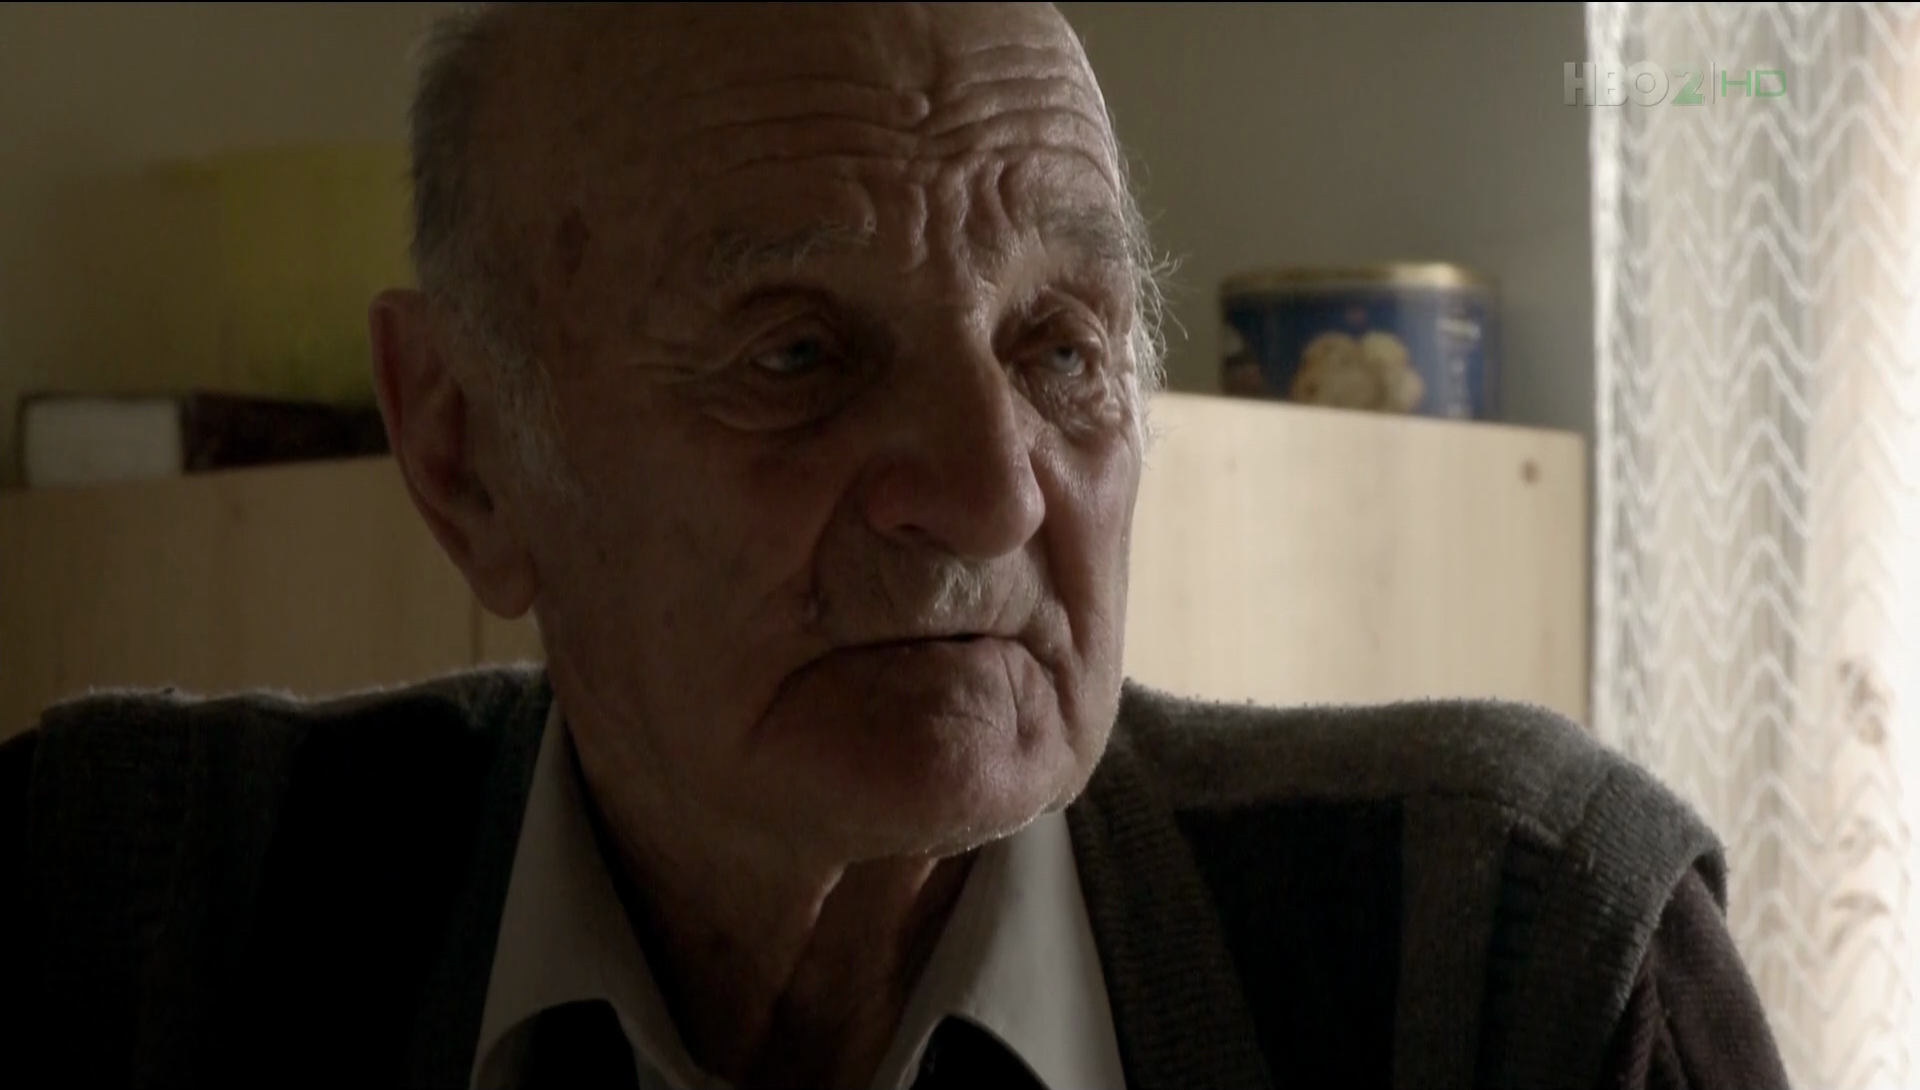 Strumień miłości / Szerelempatak (2013) PL.1080i.HDTV.H264-R2D2 / Lektor PL - film dokumentalny